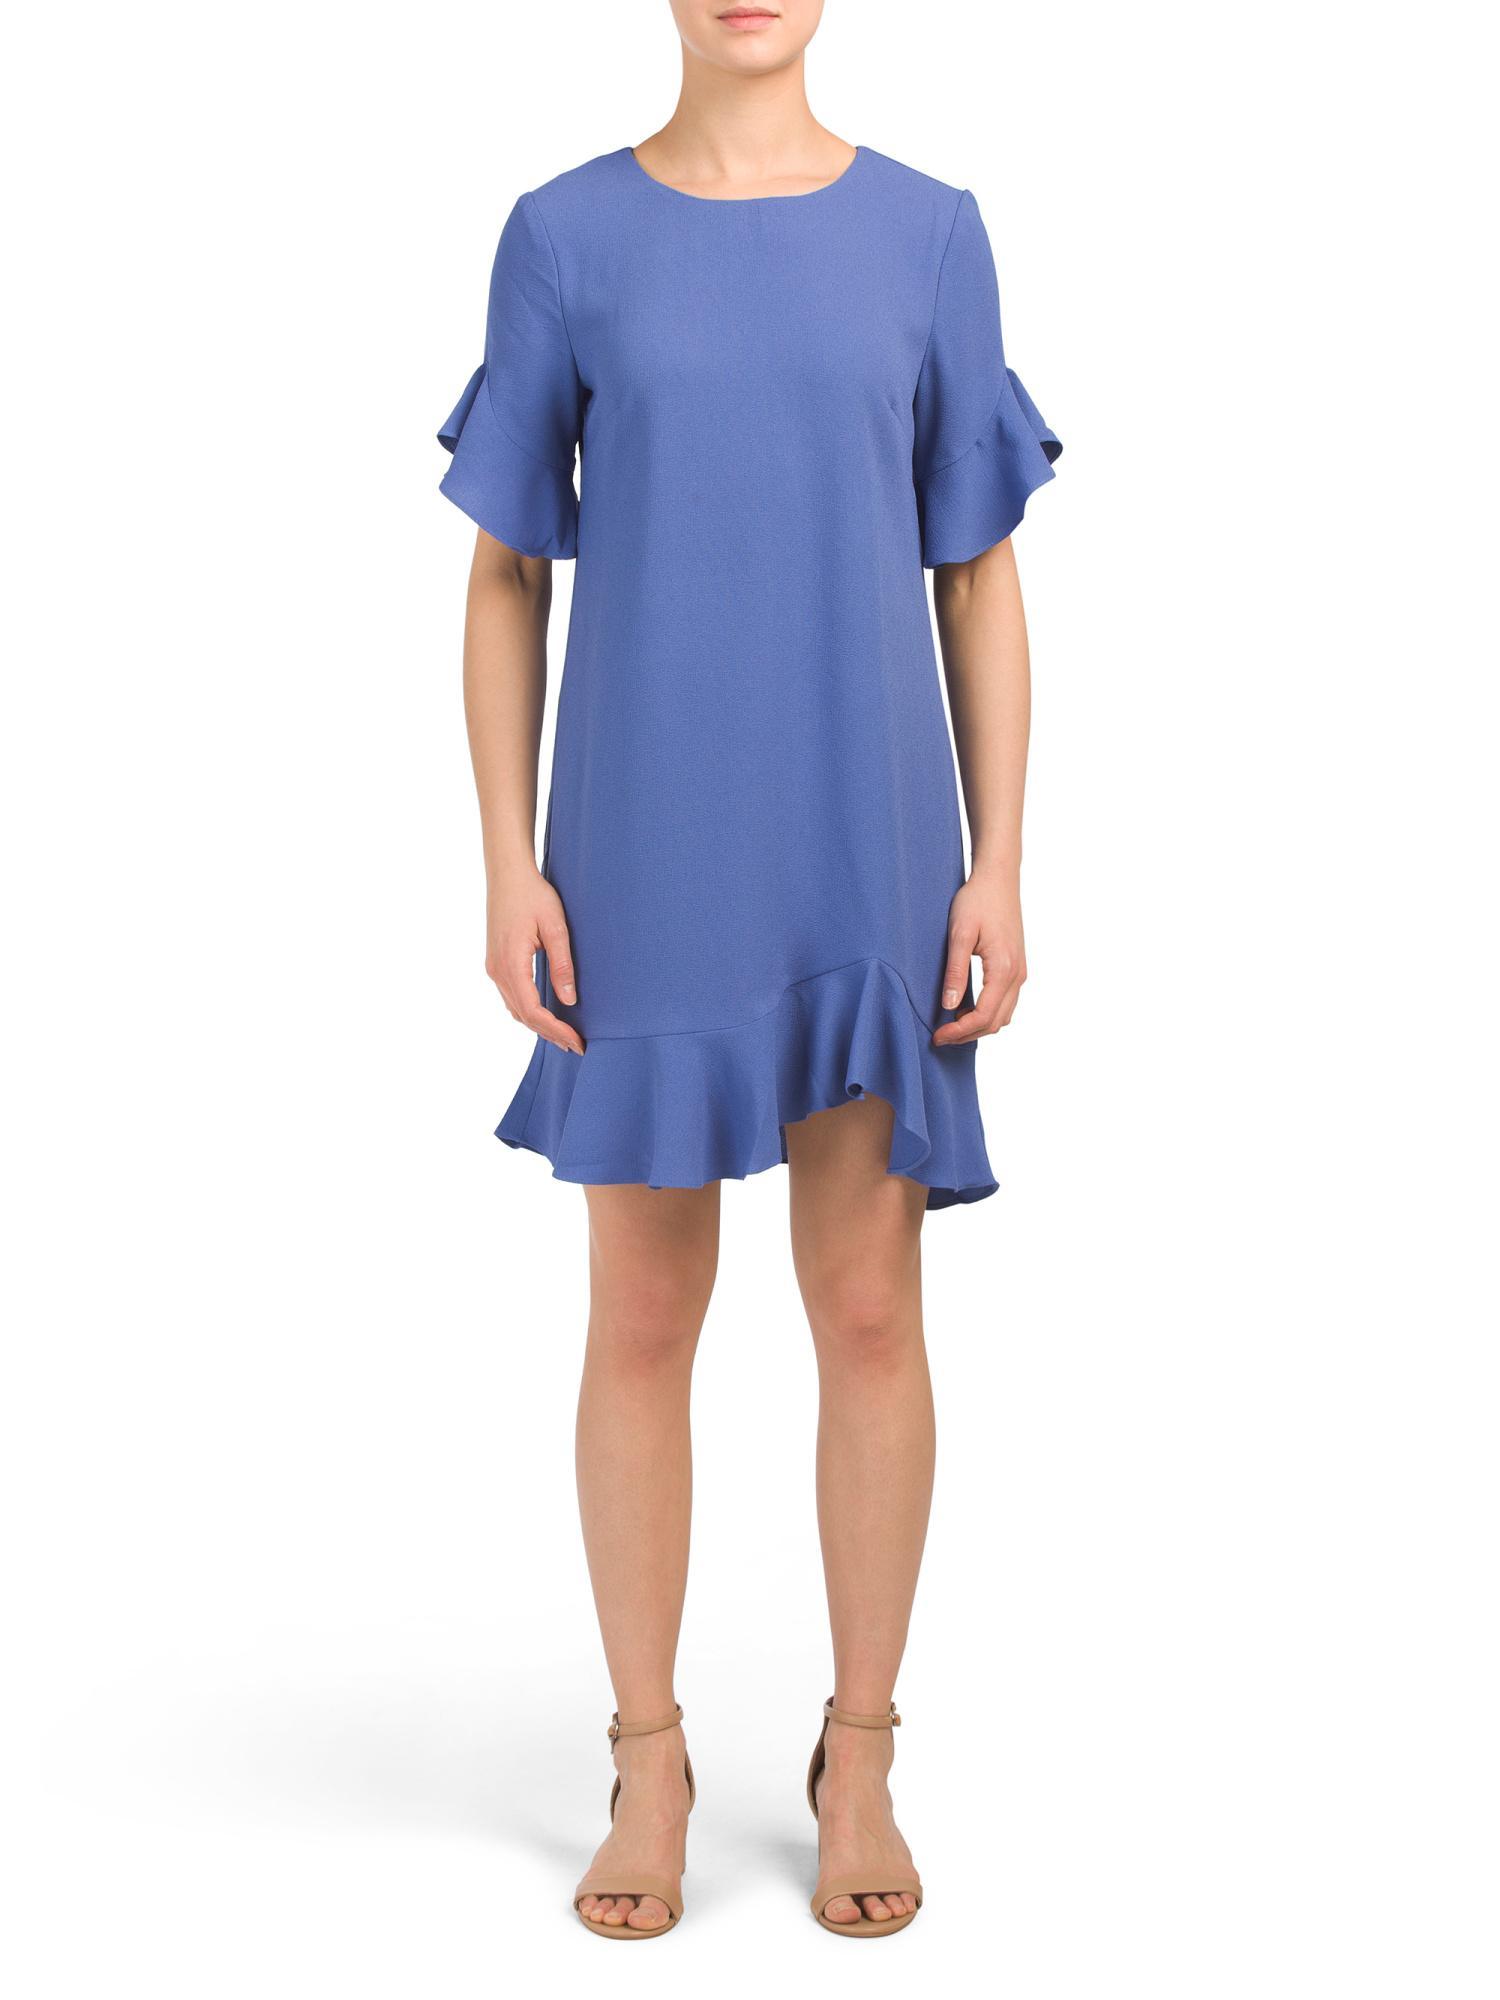 d230d3783afc Tj Maxx Made In Usa Ruffle Detail Shift Dress in Blue - Lyst